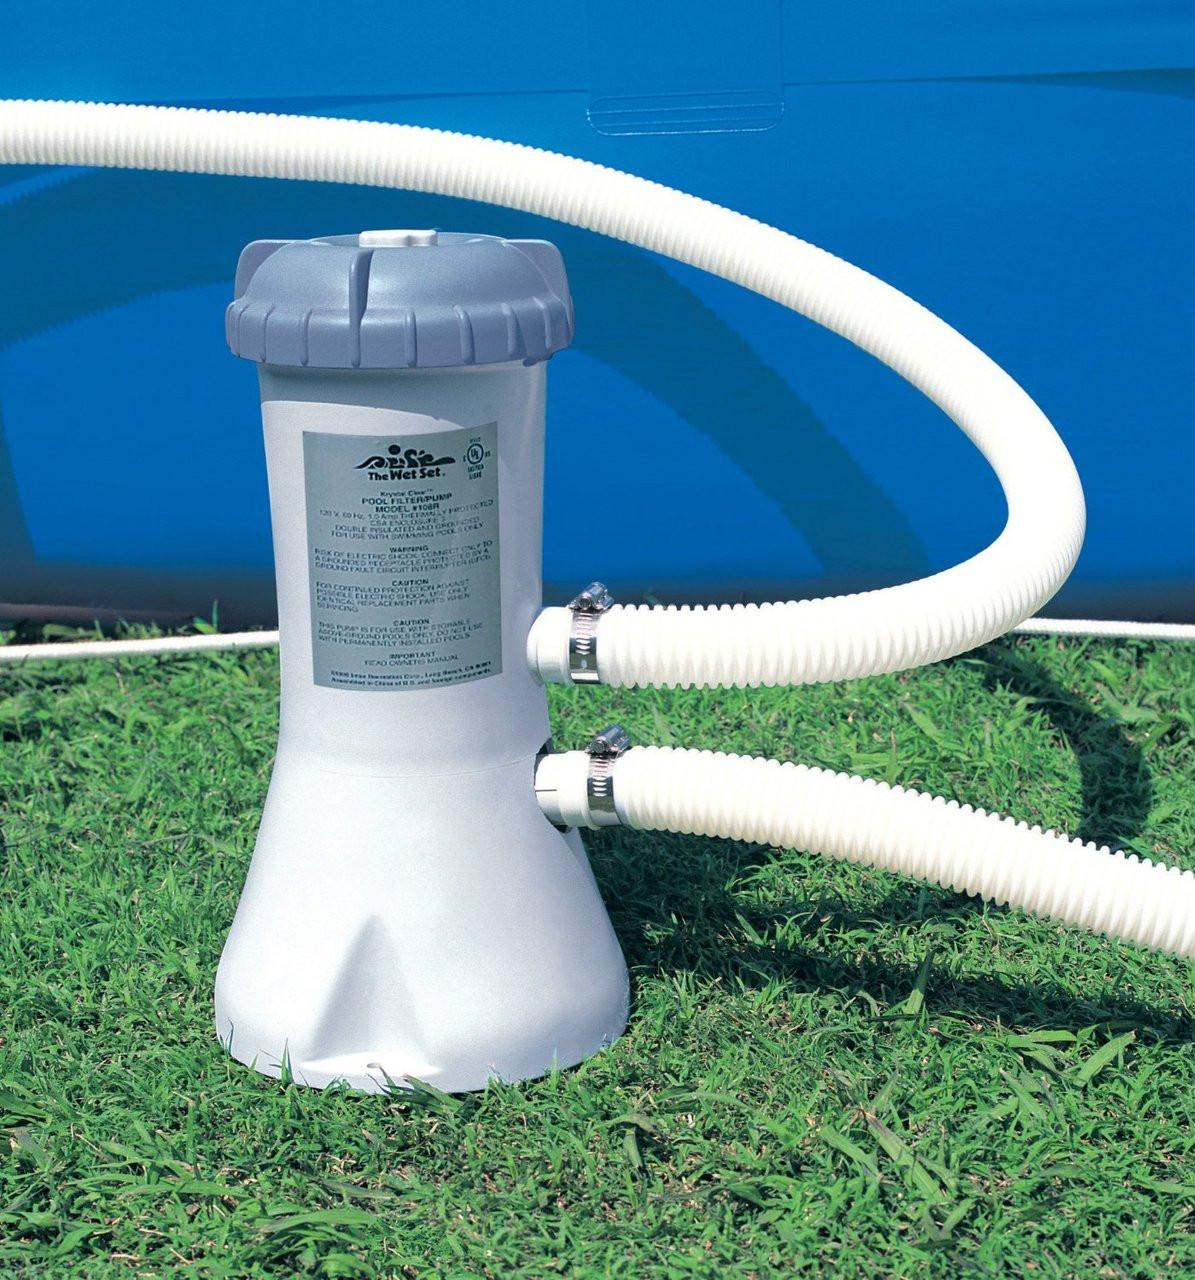 Intex 1000 Gallon Swimming Pool Cartridge Filter Pump System (28638)